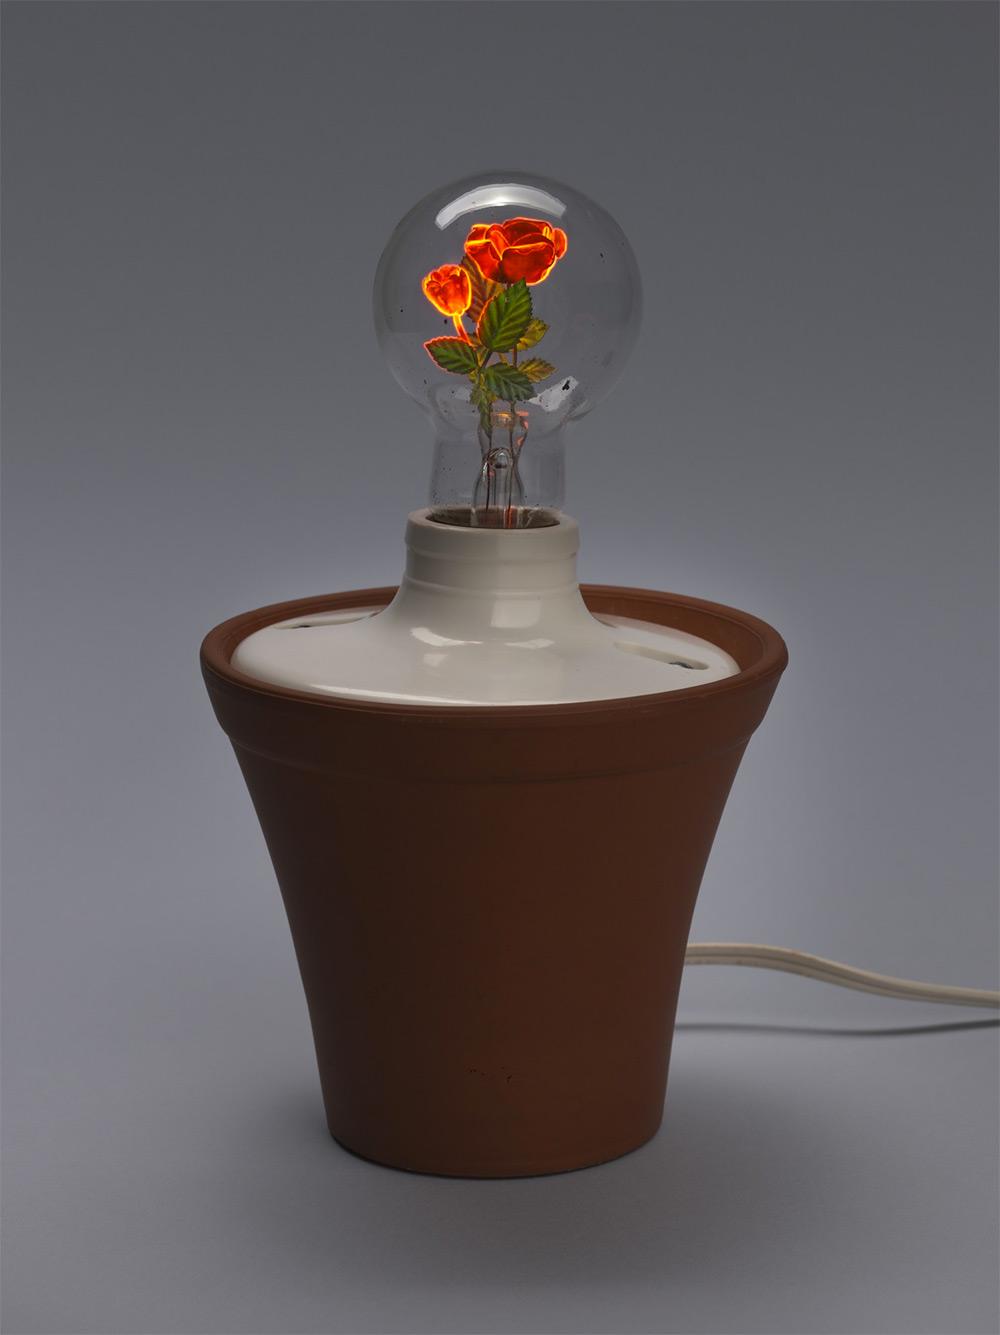 Dan Flavin, Roses . Aerolux Flowerlite light bulb, ceramic flower pot, cord and light switch. 8 1/2